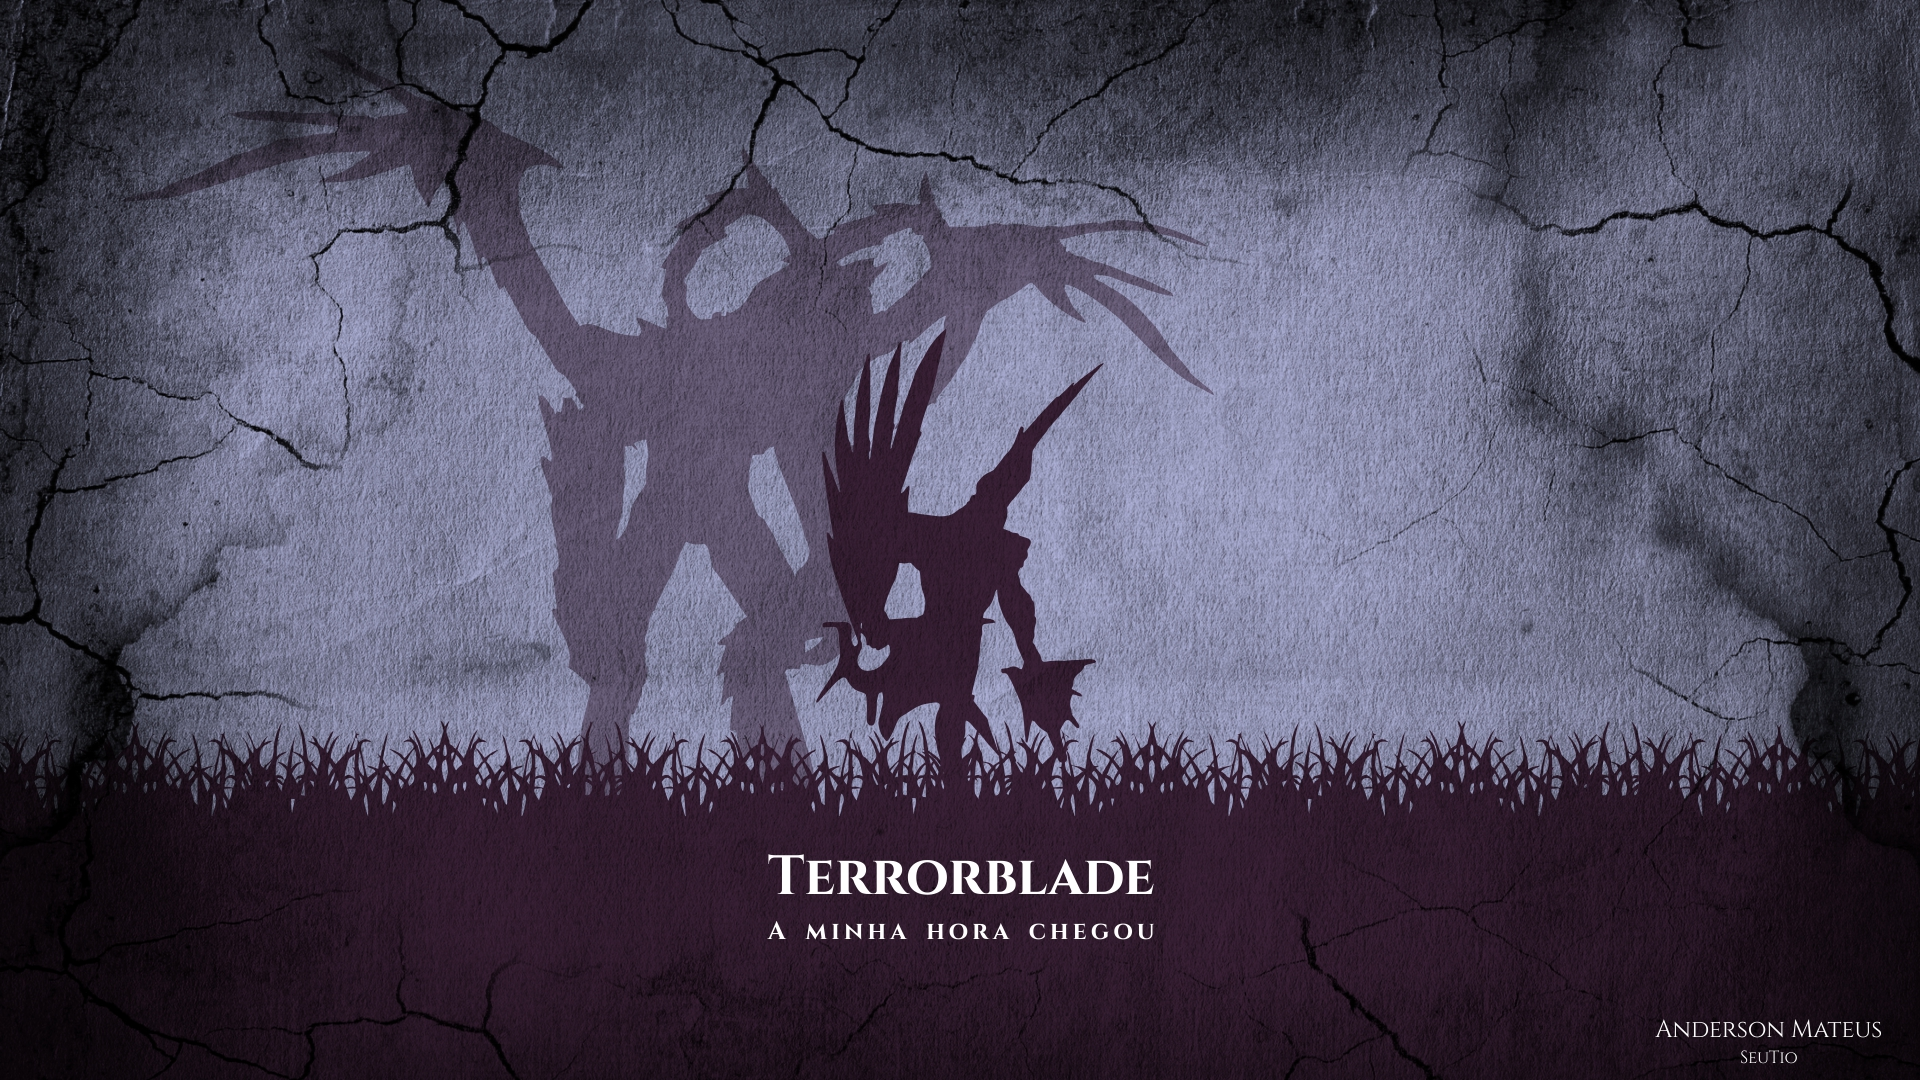 Terrorblade Minimalista Full HD Wallpaper And Background Image